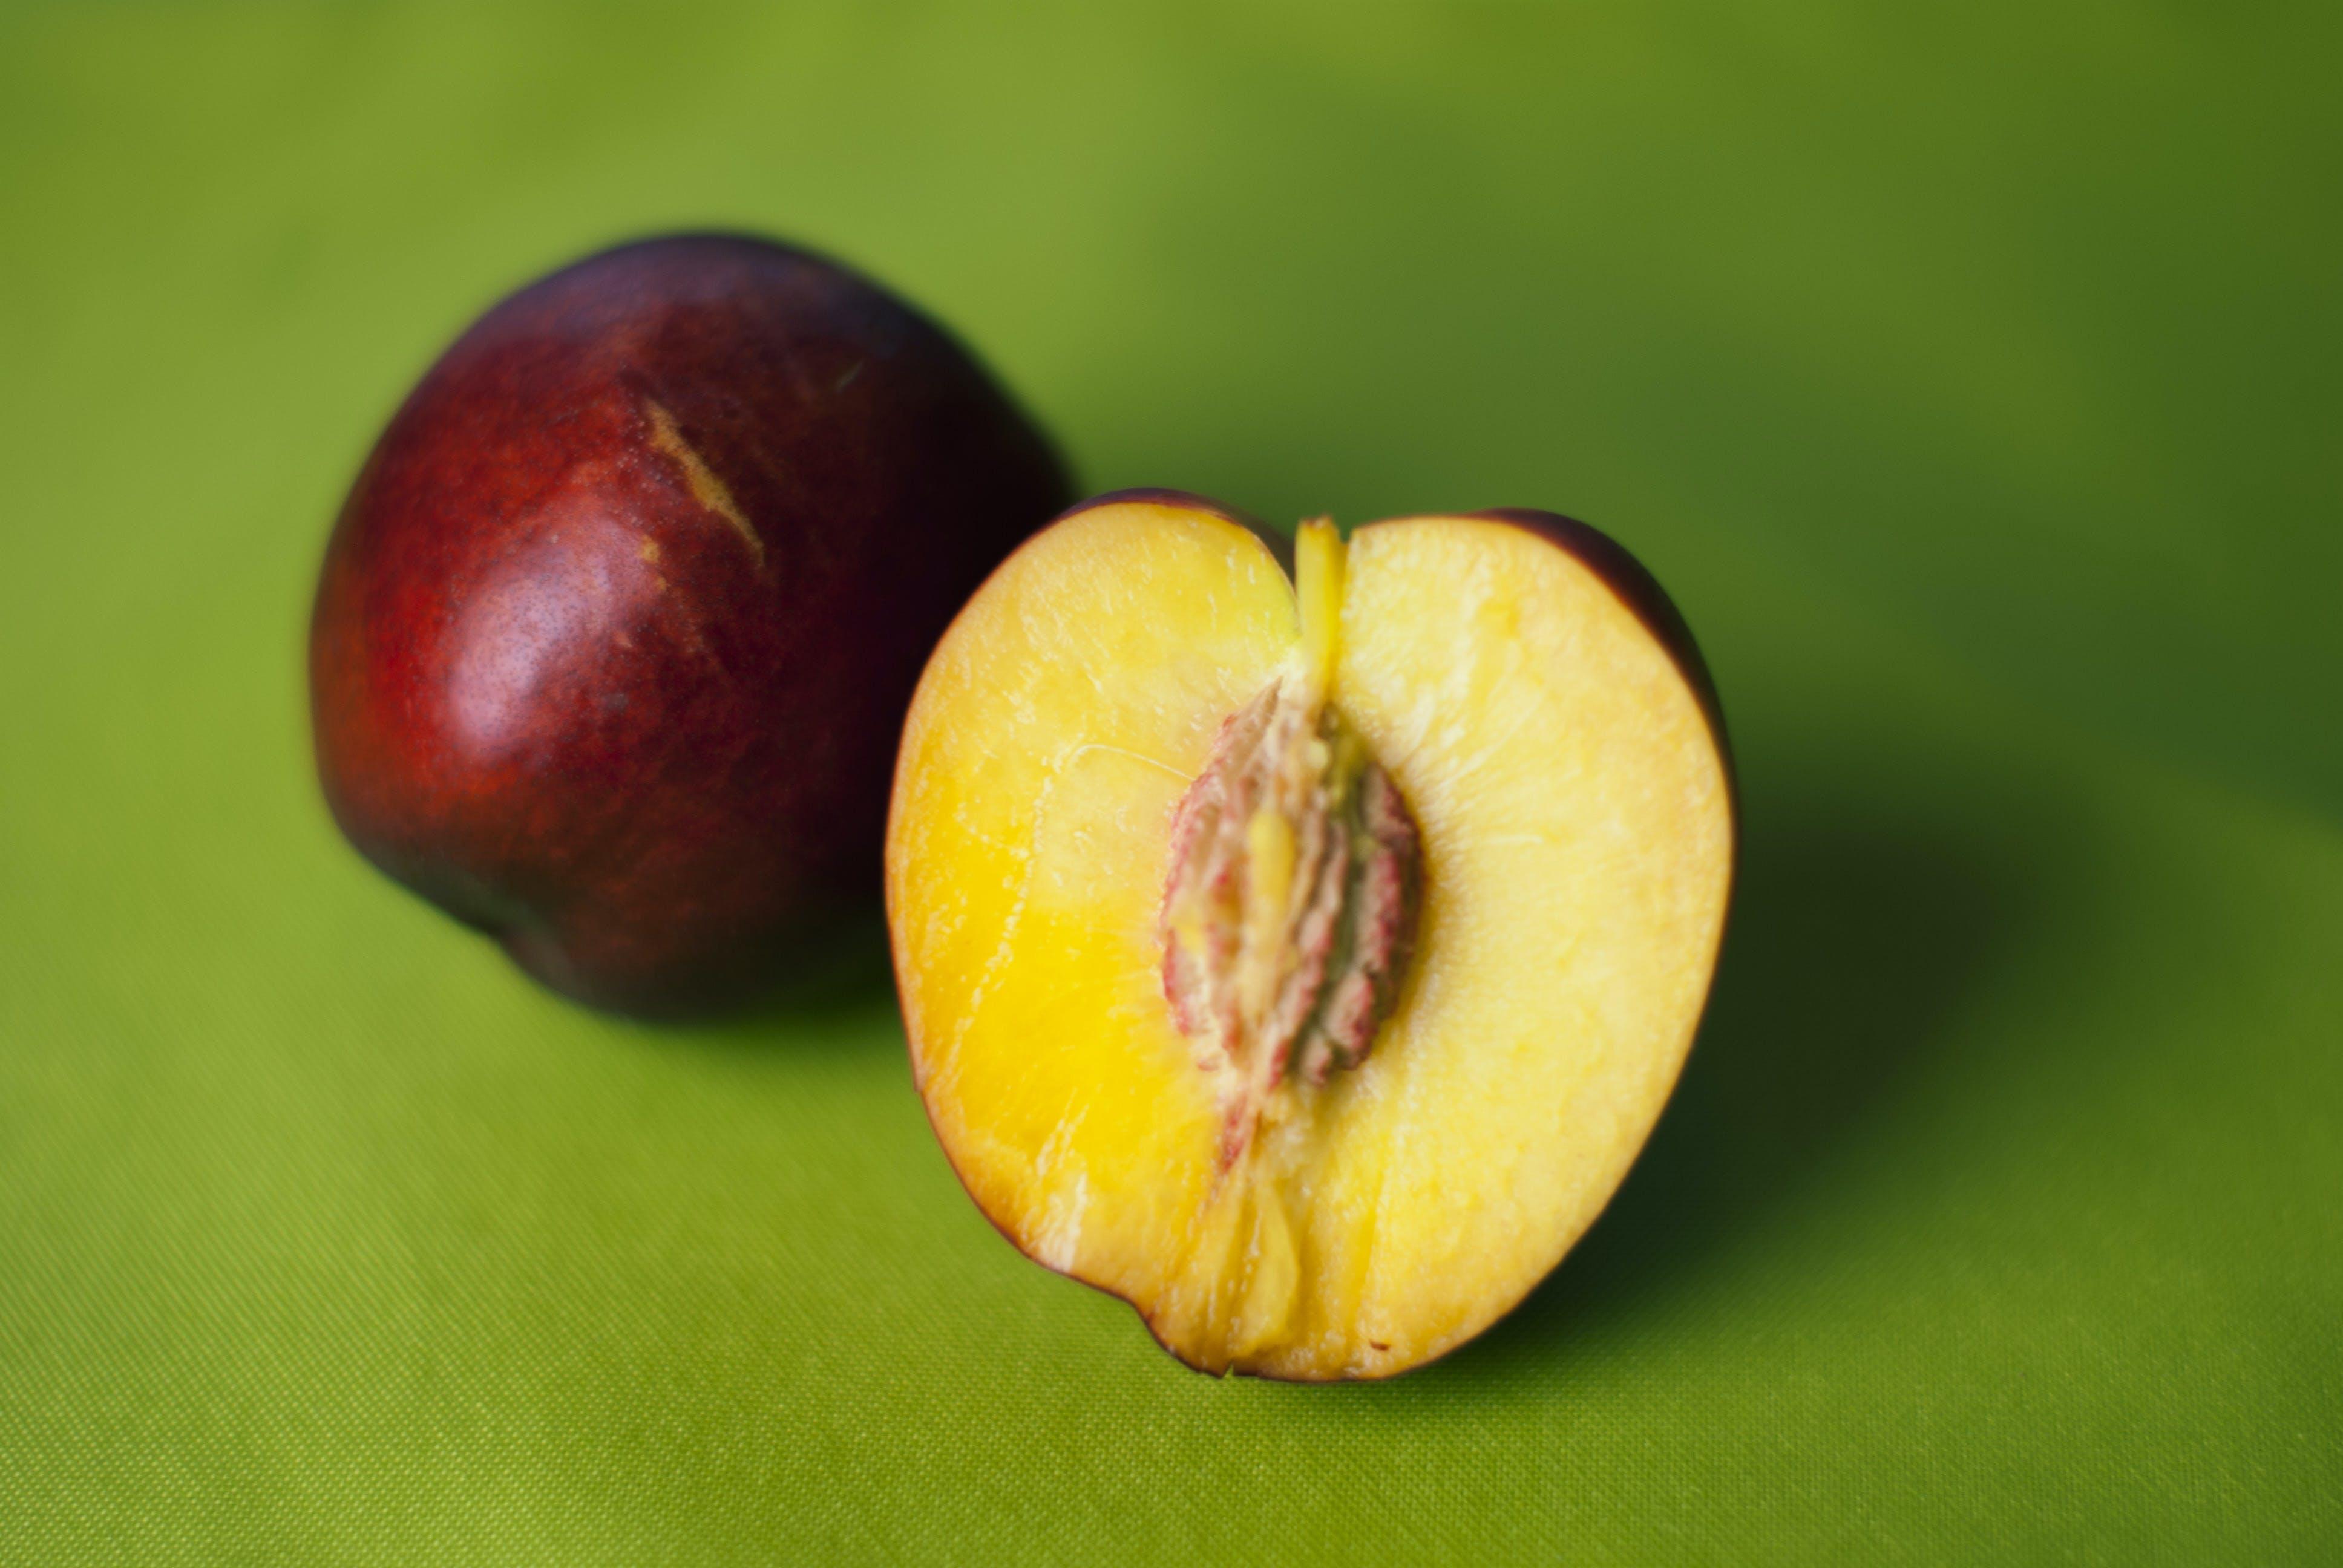 Peach Apple on Green Mat